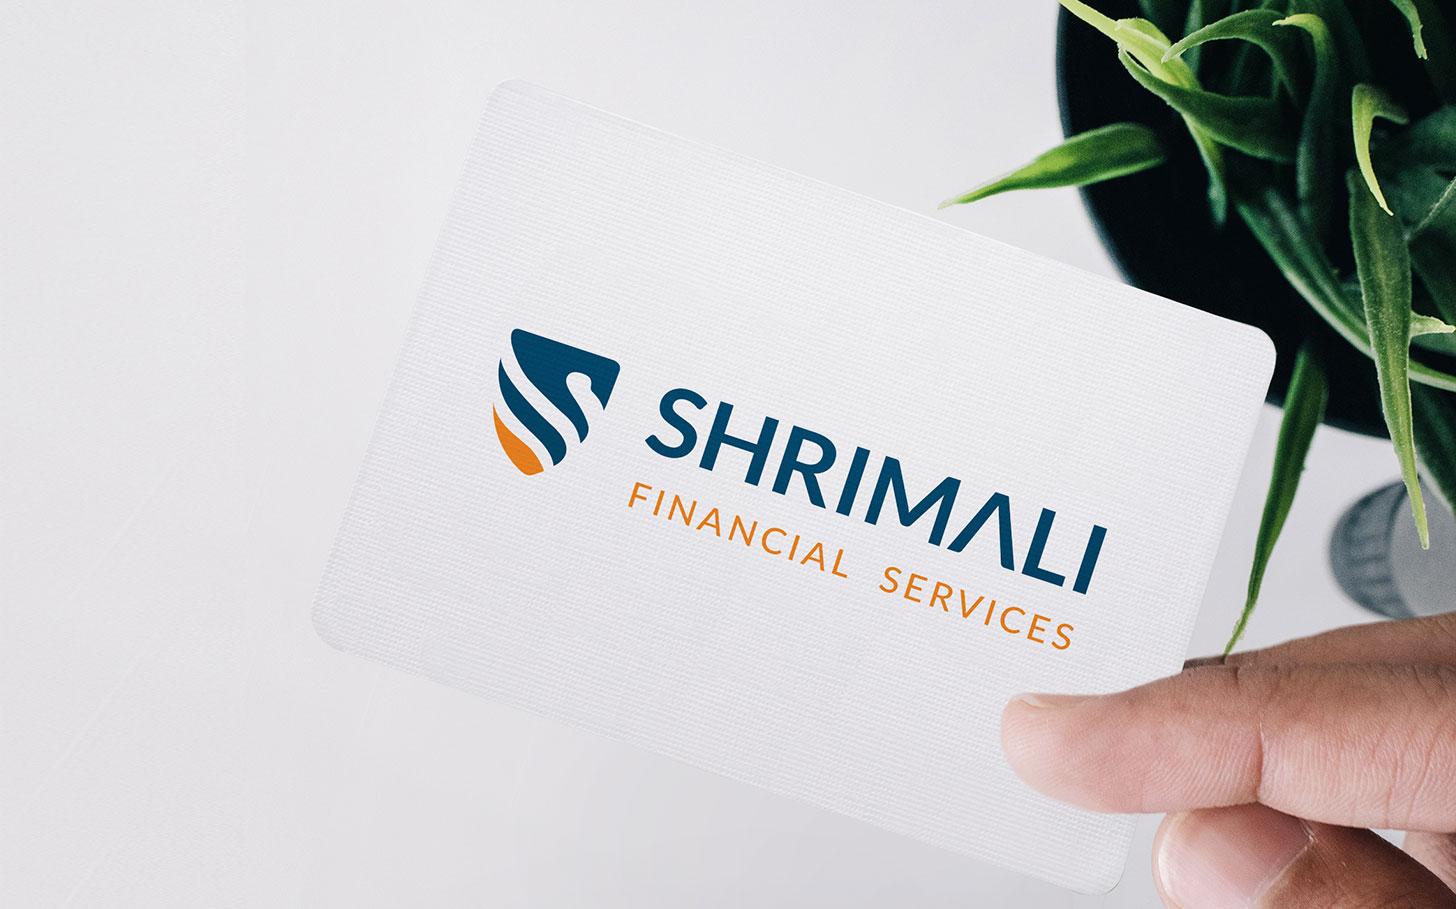 Shrimali_1